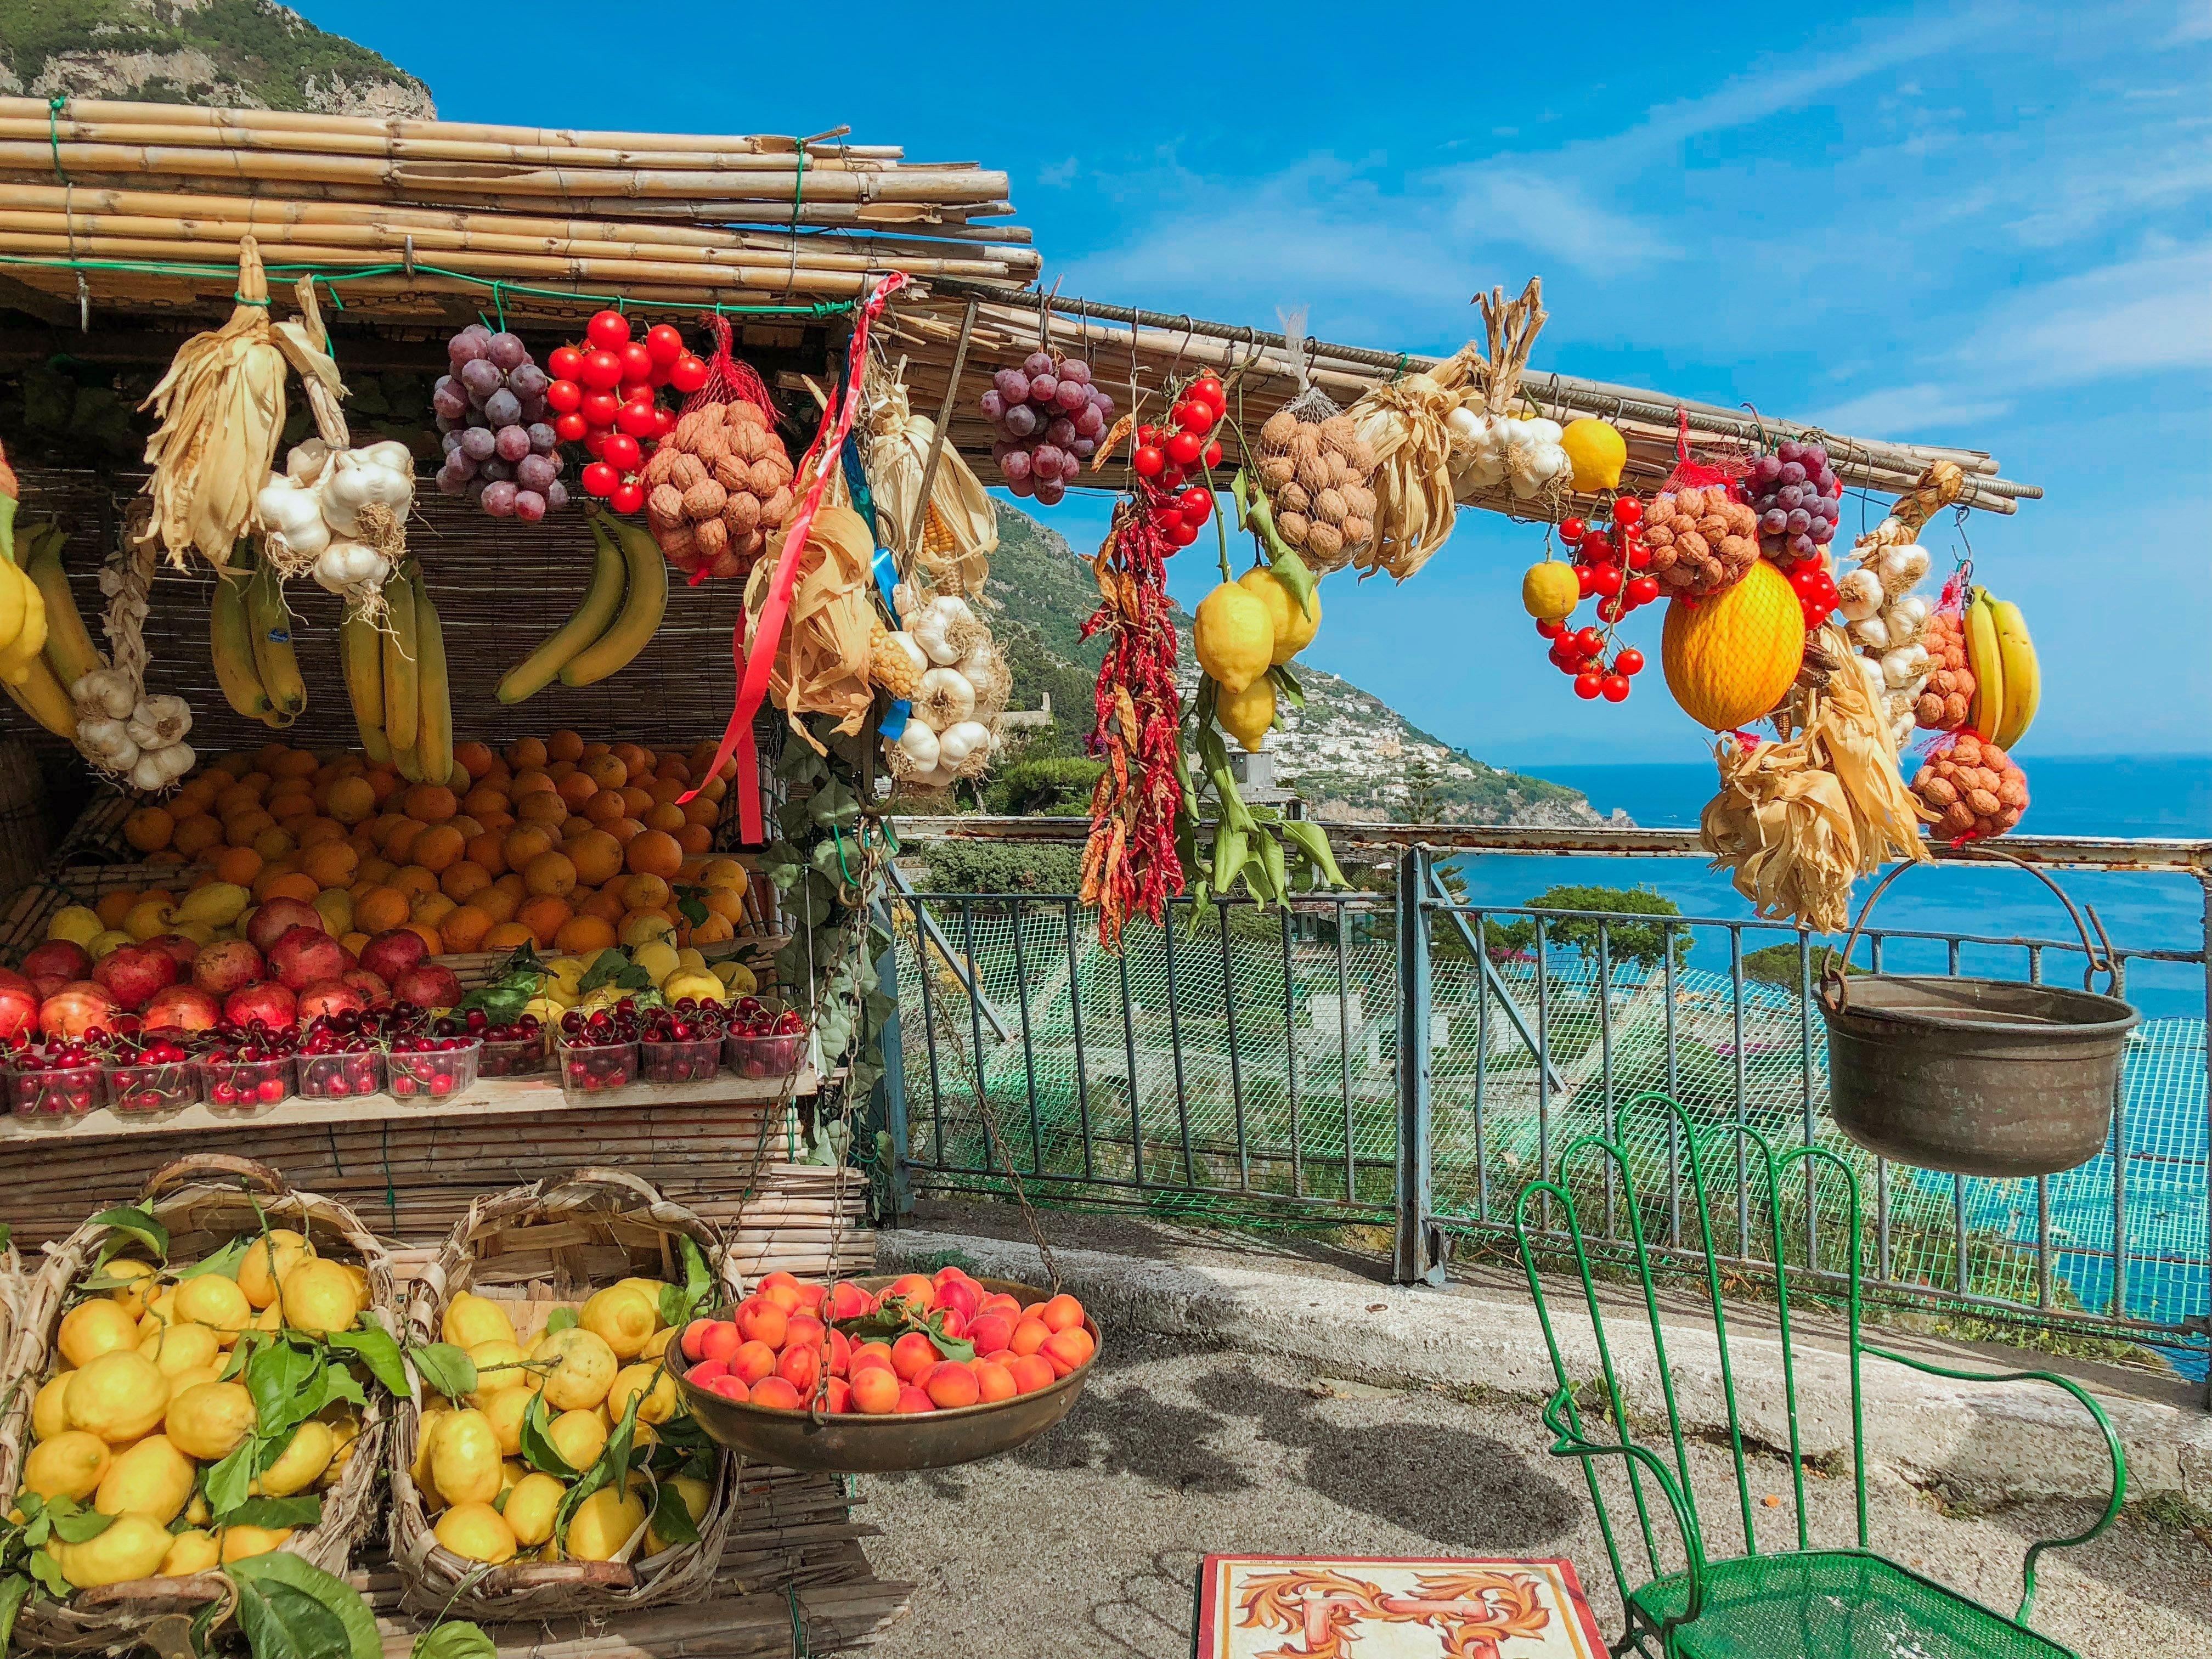 Fruit stand, Positano